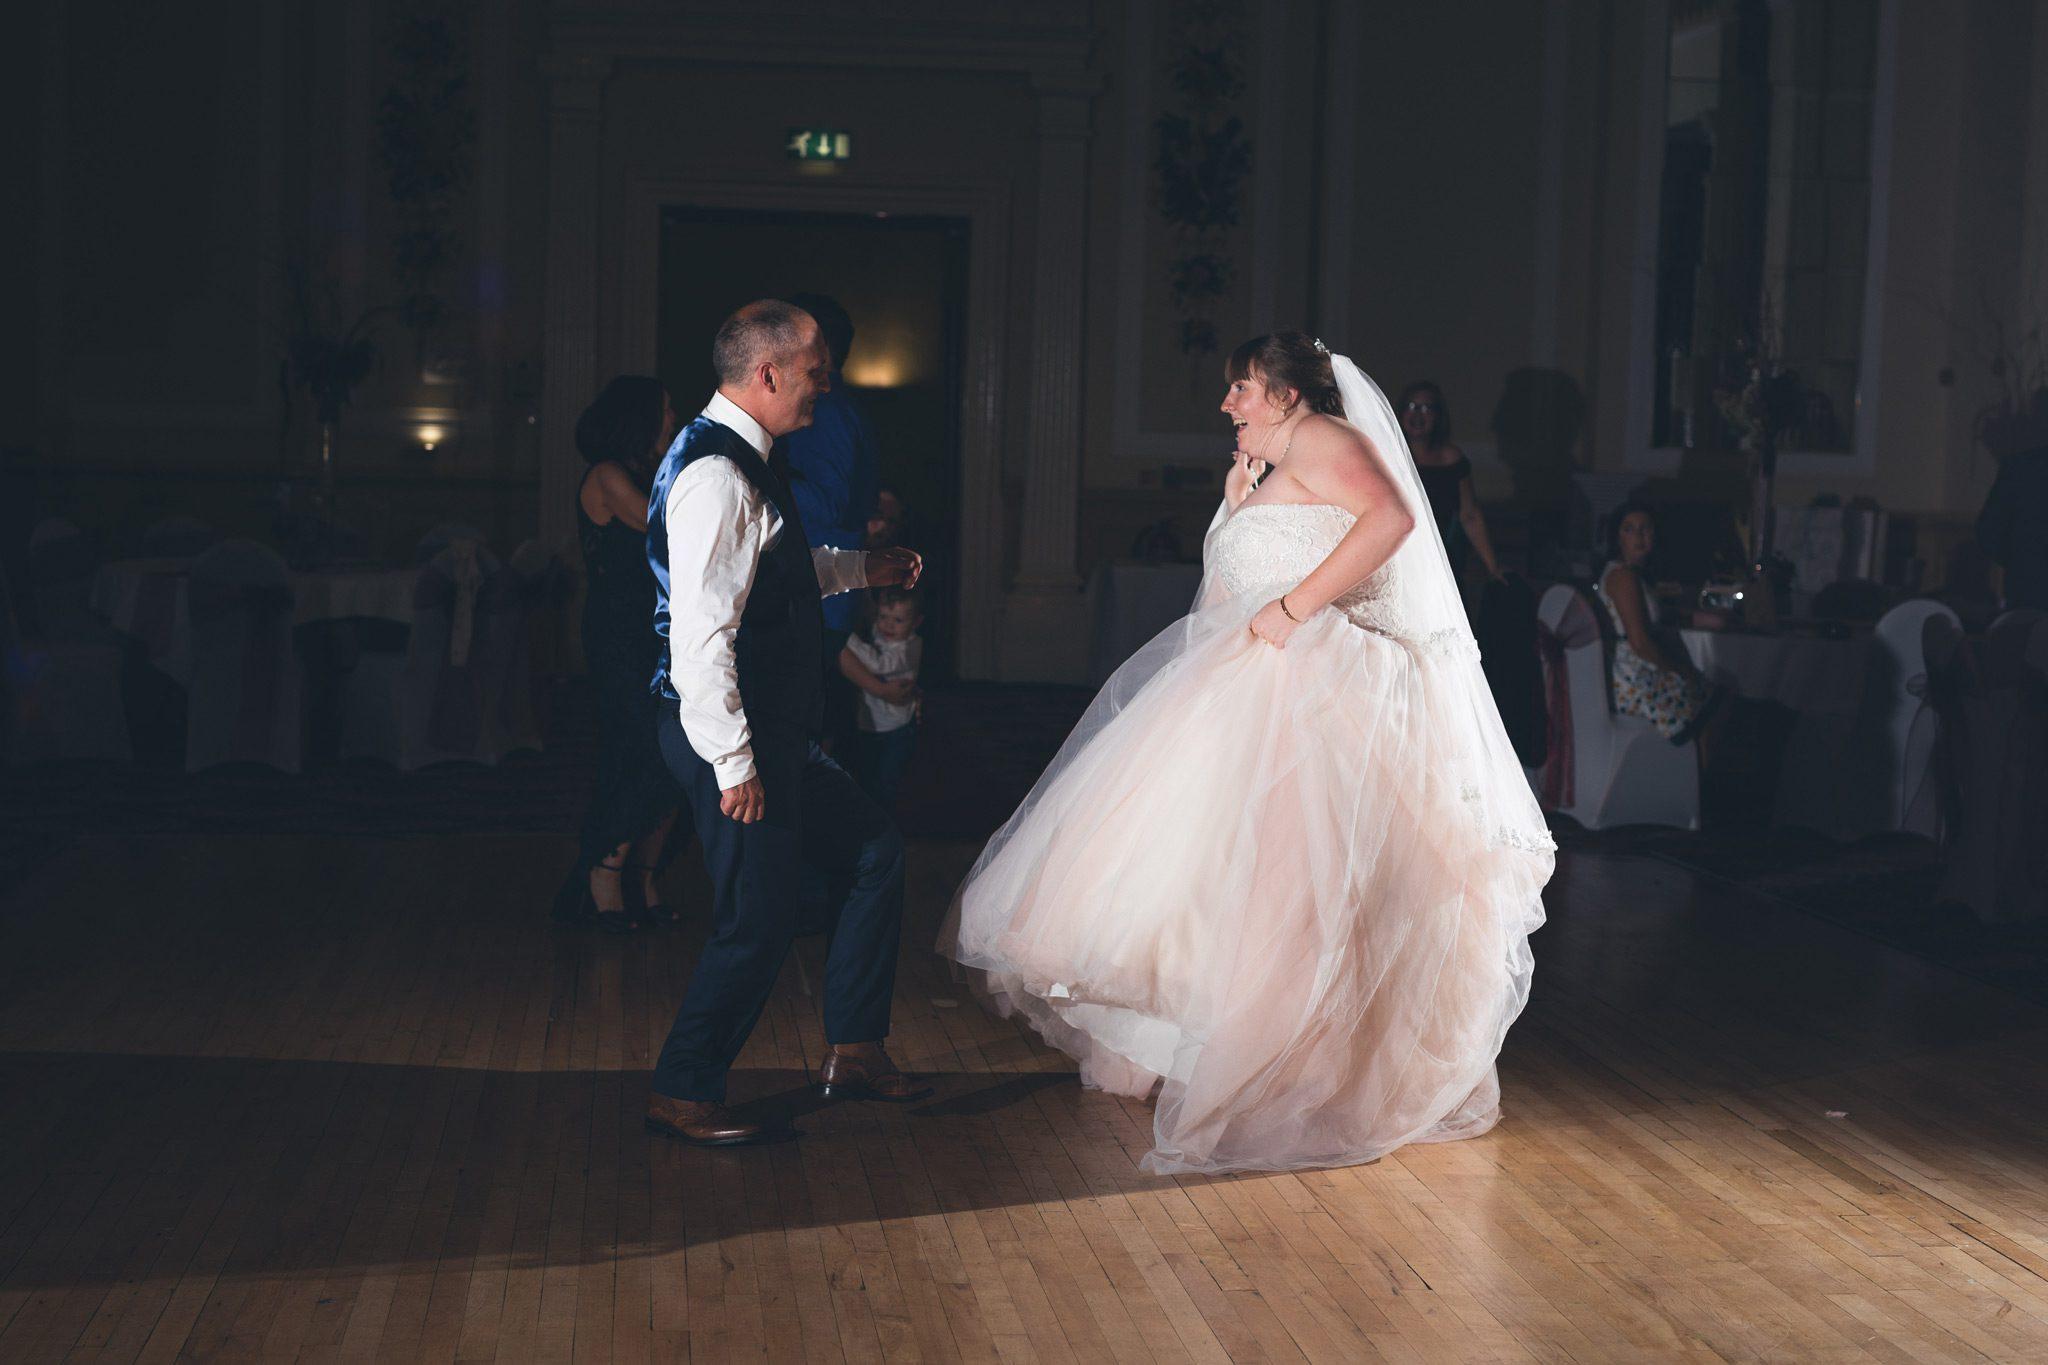 Dancing at The Palace Hotel